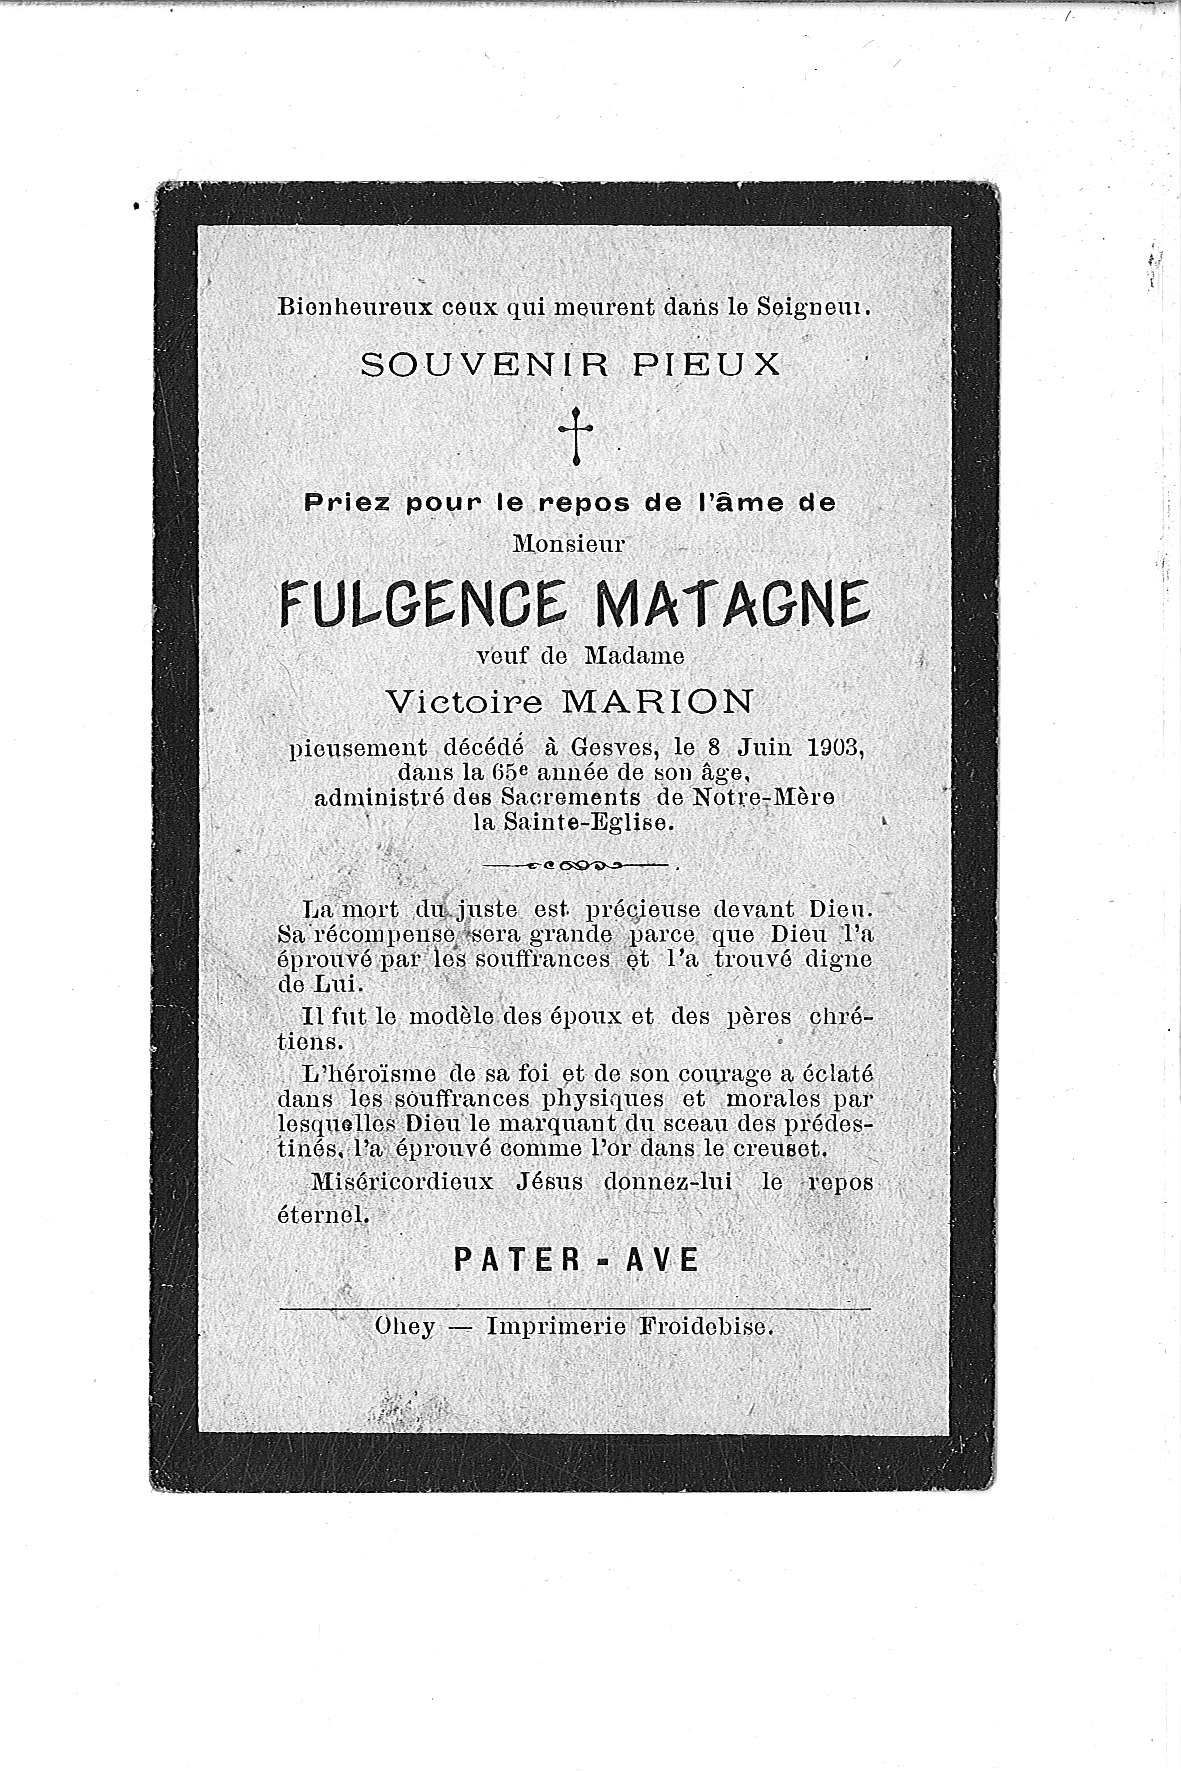 Fulgence(1903)20120227085536_00046.jpg